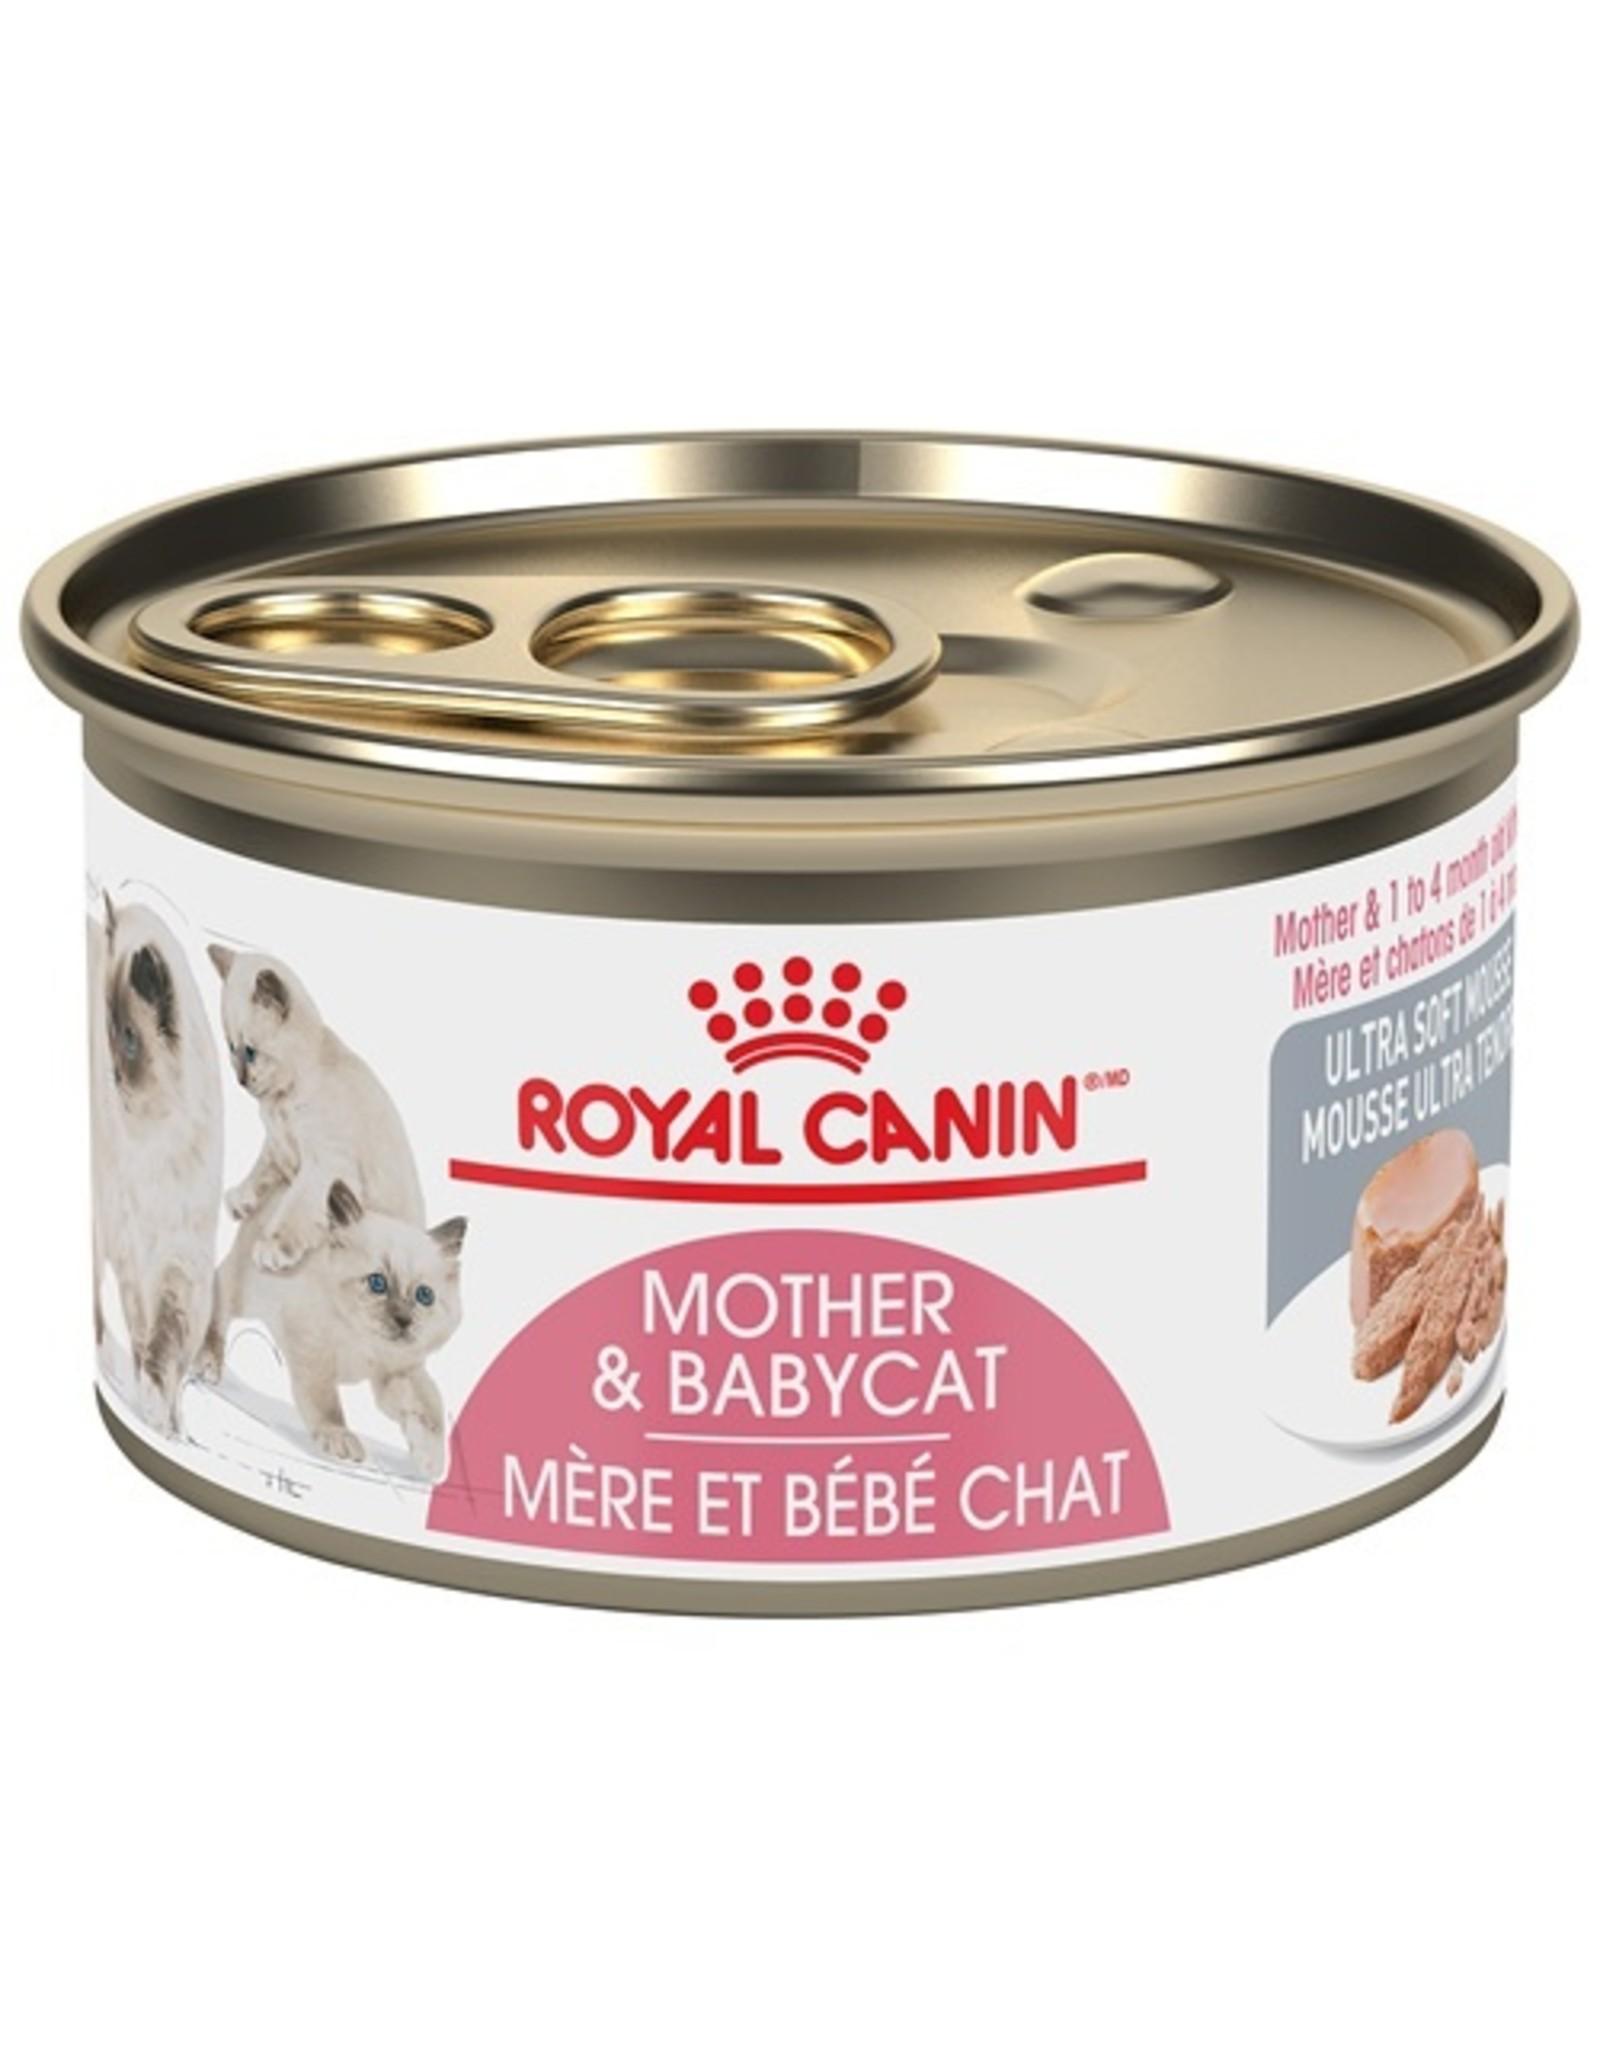 Royal Canin Royal Canin Babycat Instinctive Loaf 85g